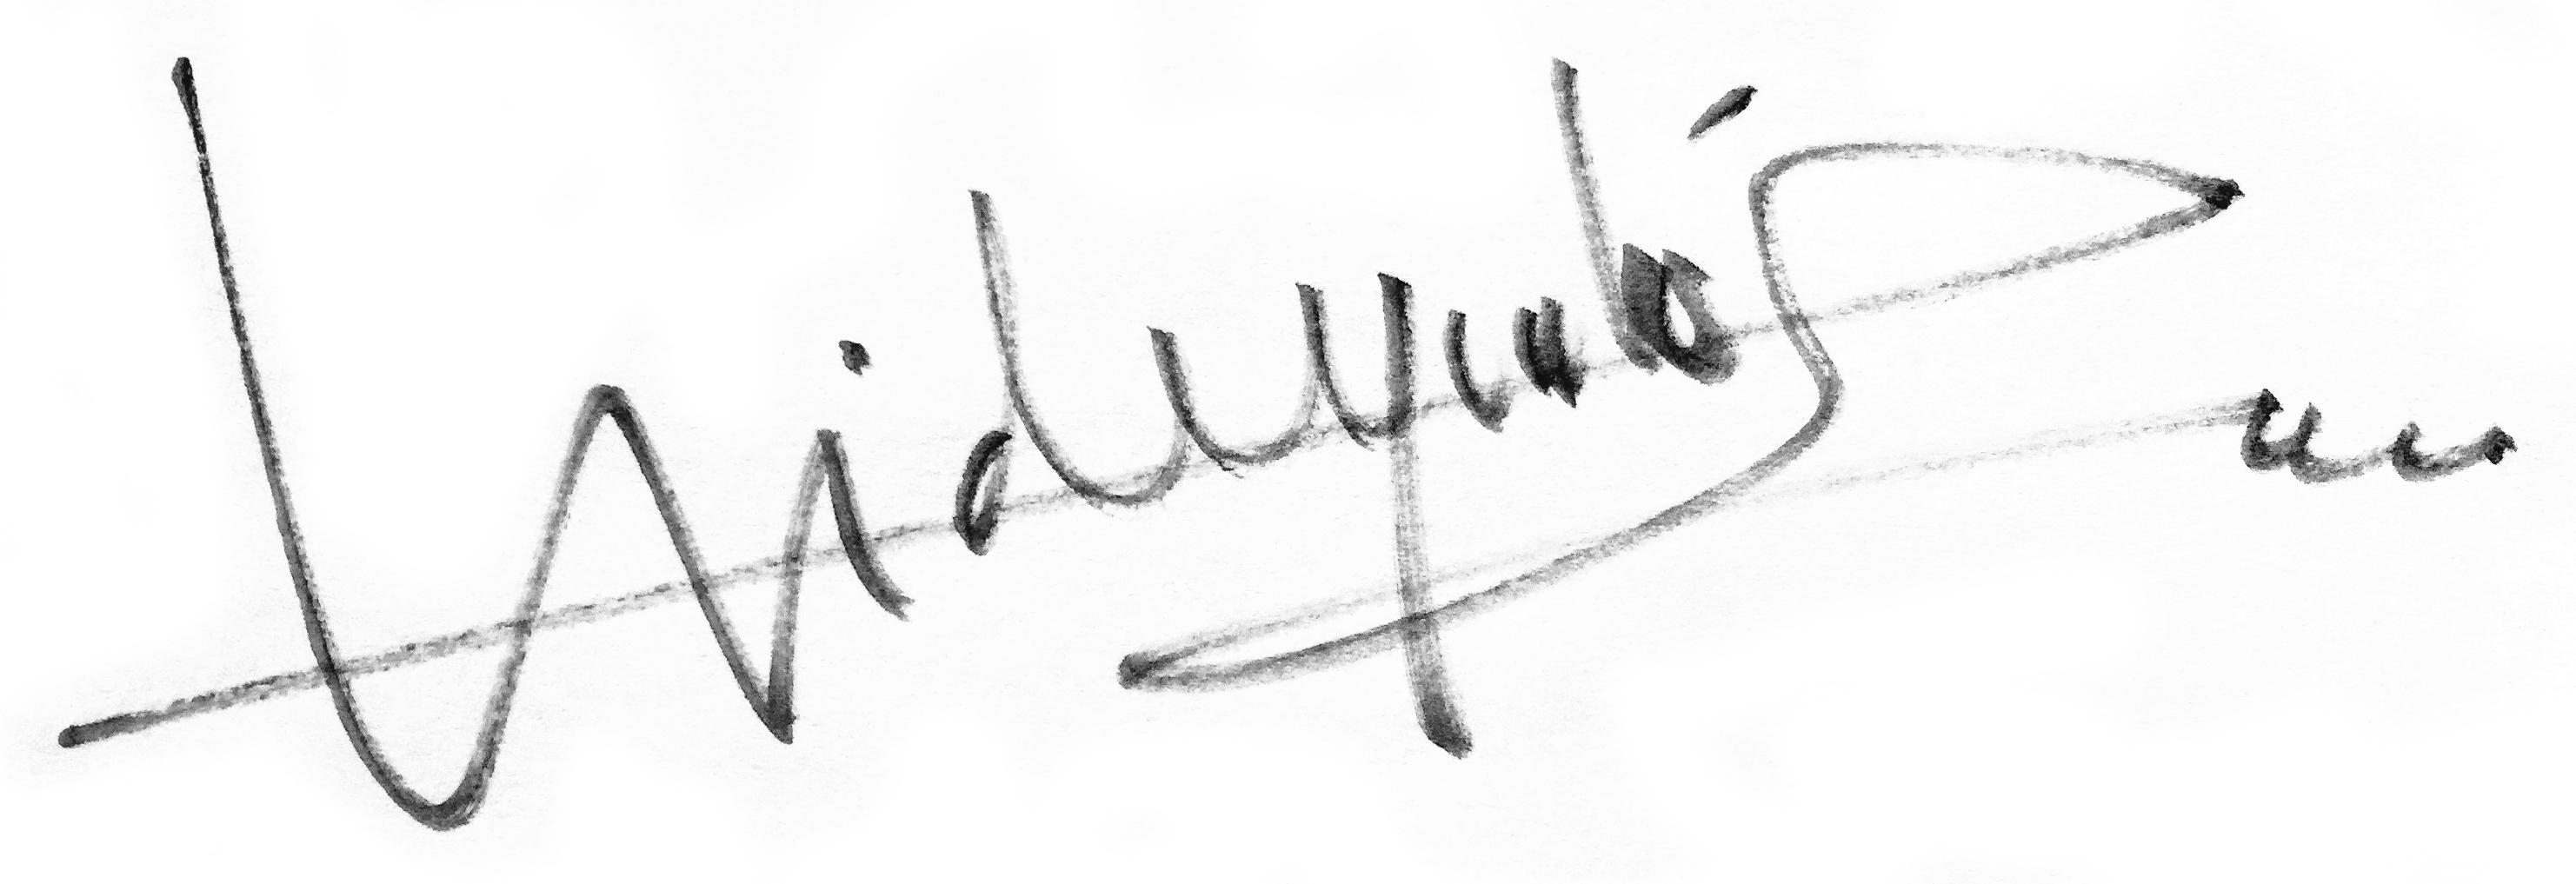 Hideyuki Sobue Signature